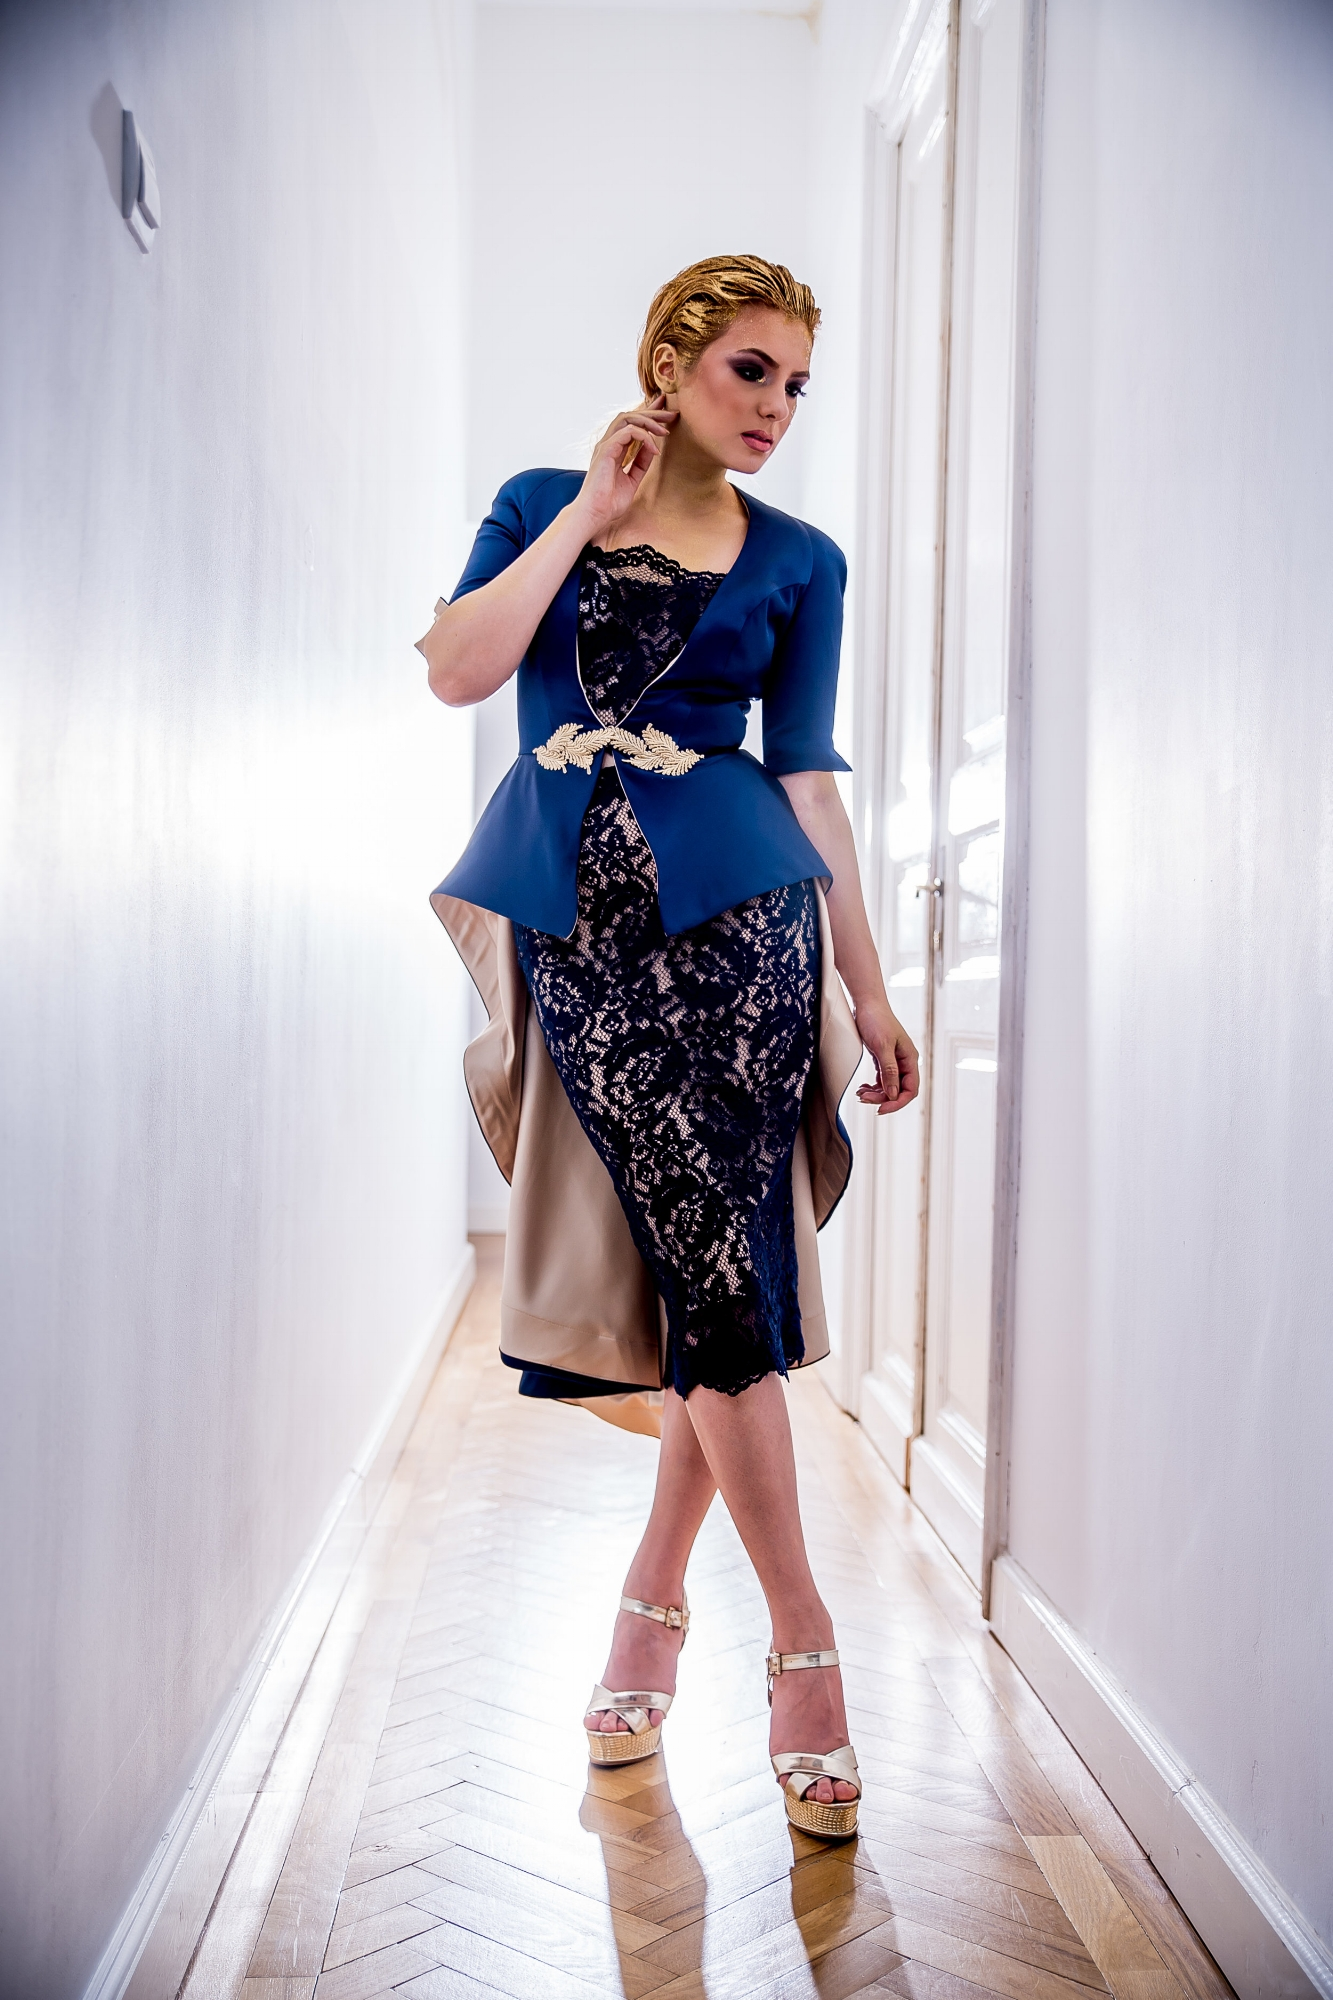 evening dress Fashion by Laina - style 7 Amber TAF001 (6).jpg